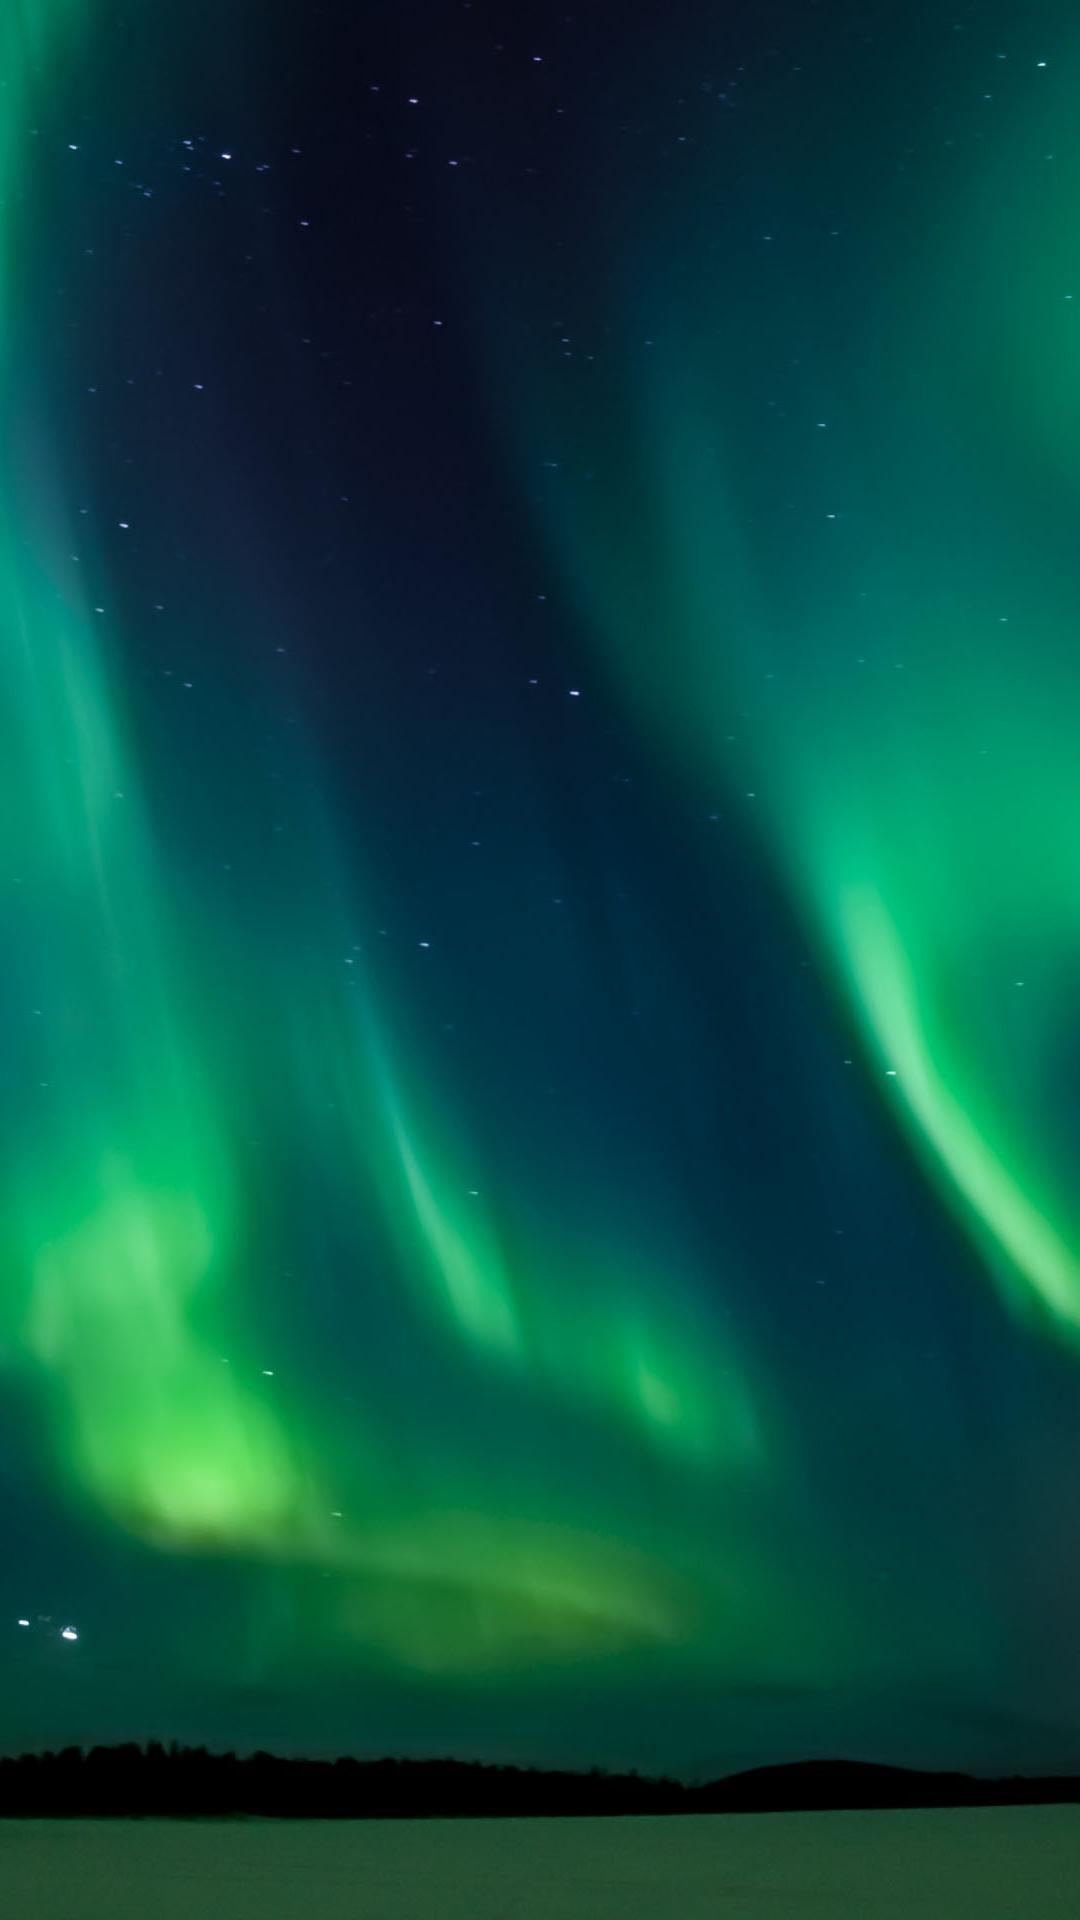 Aurora Borealis Wallpaper - Bing images